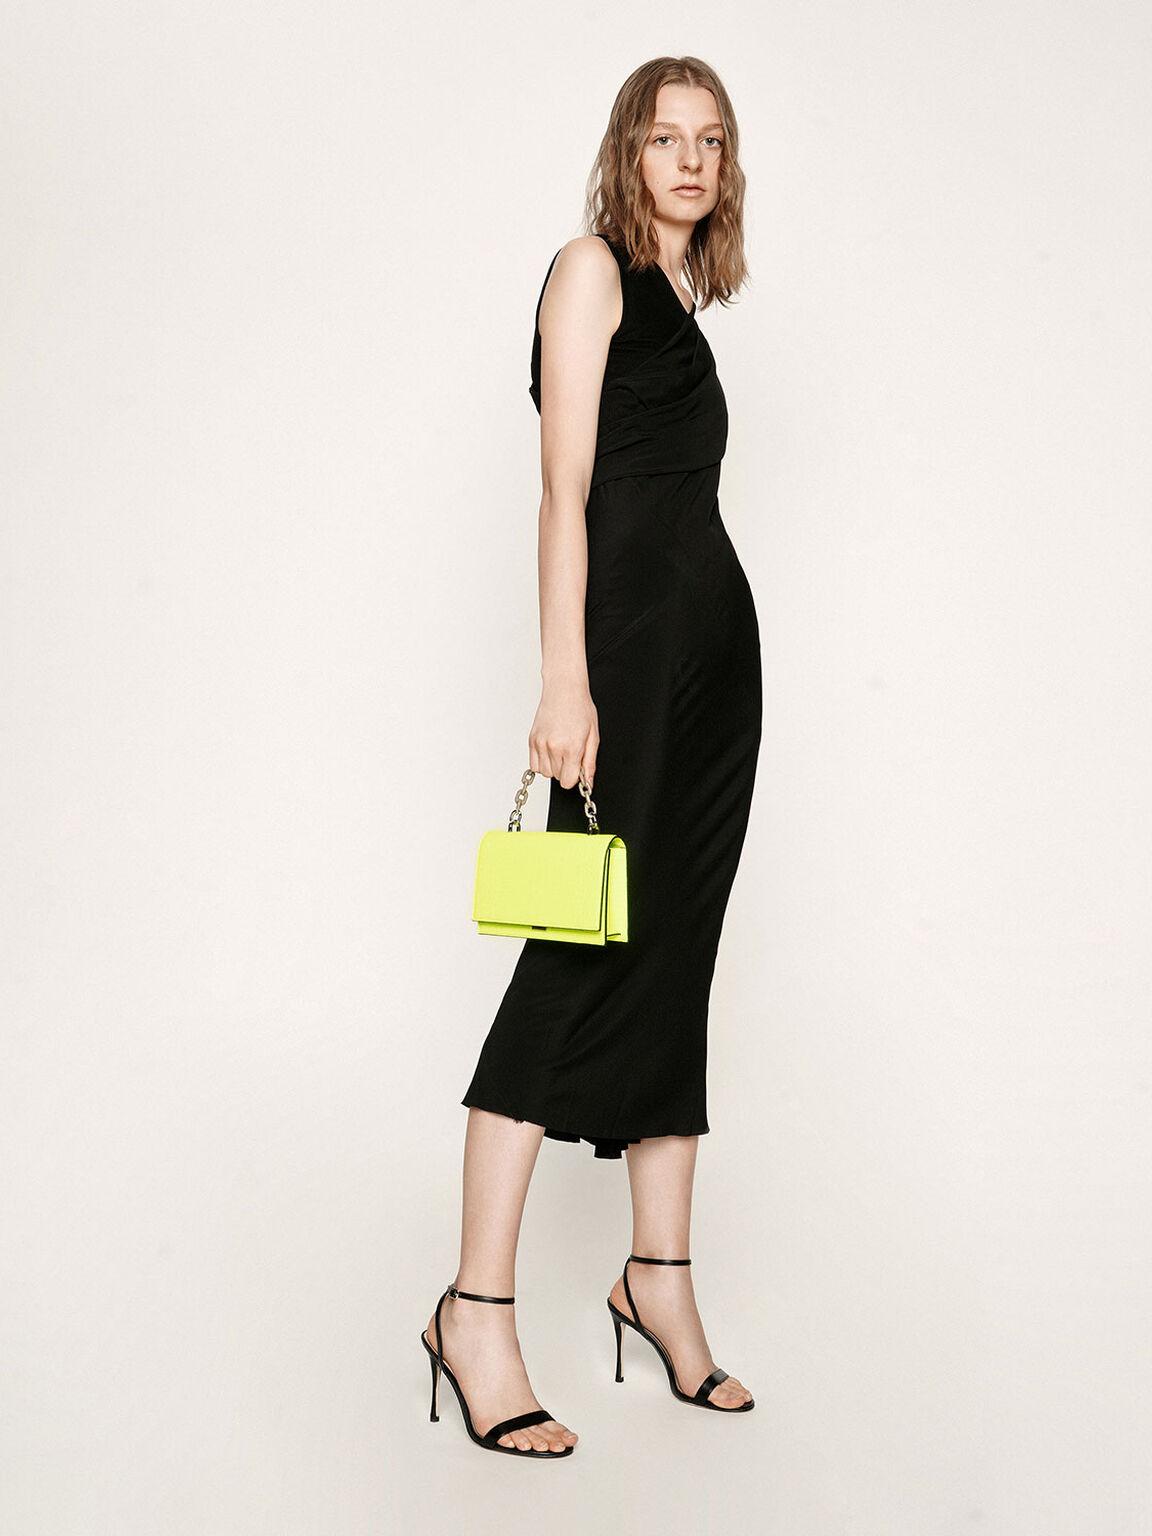 Stiletto Heels, Black, hi-res